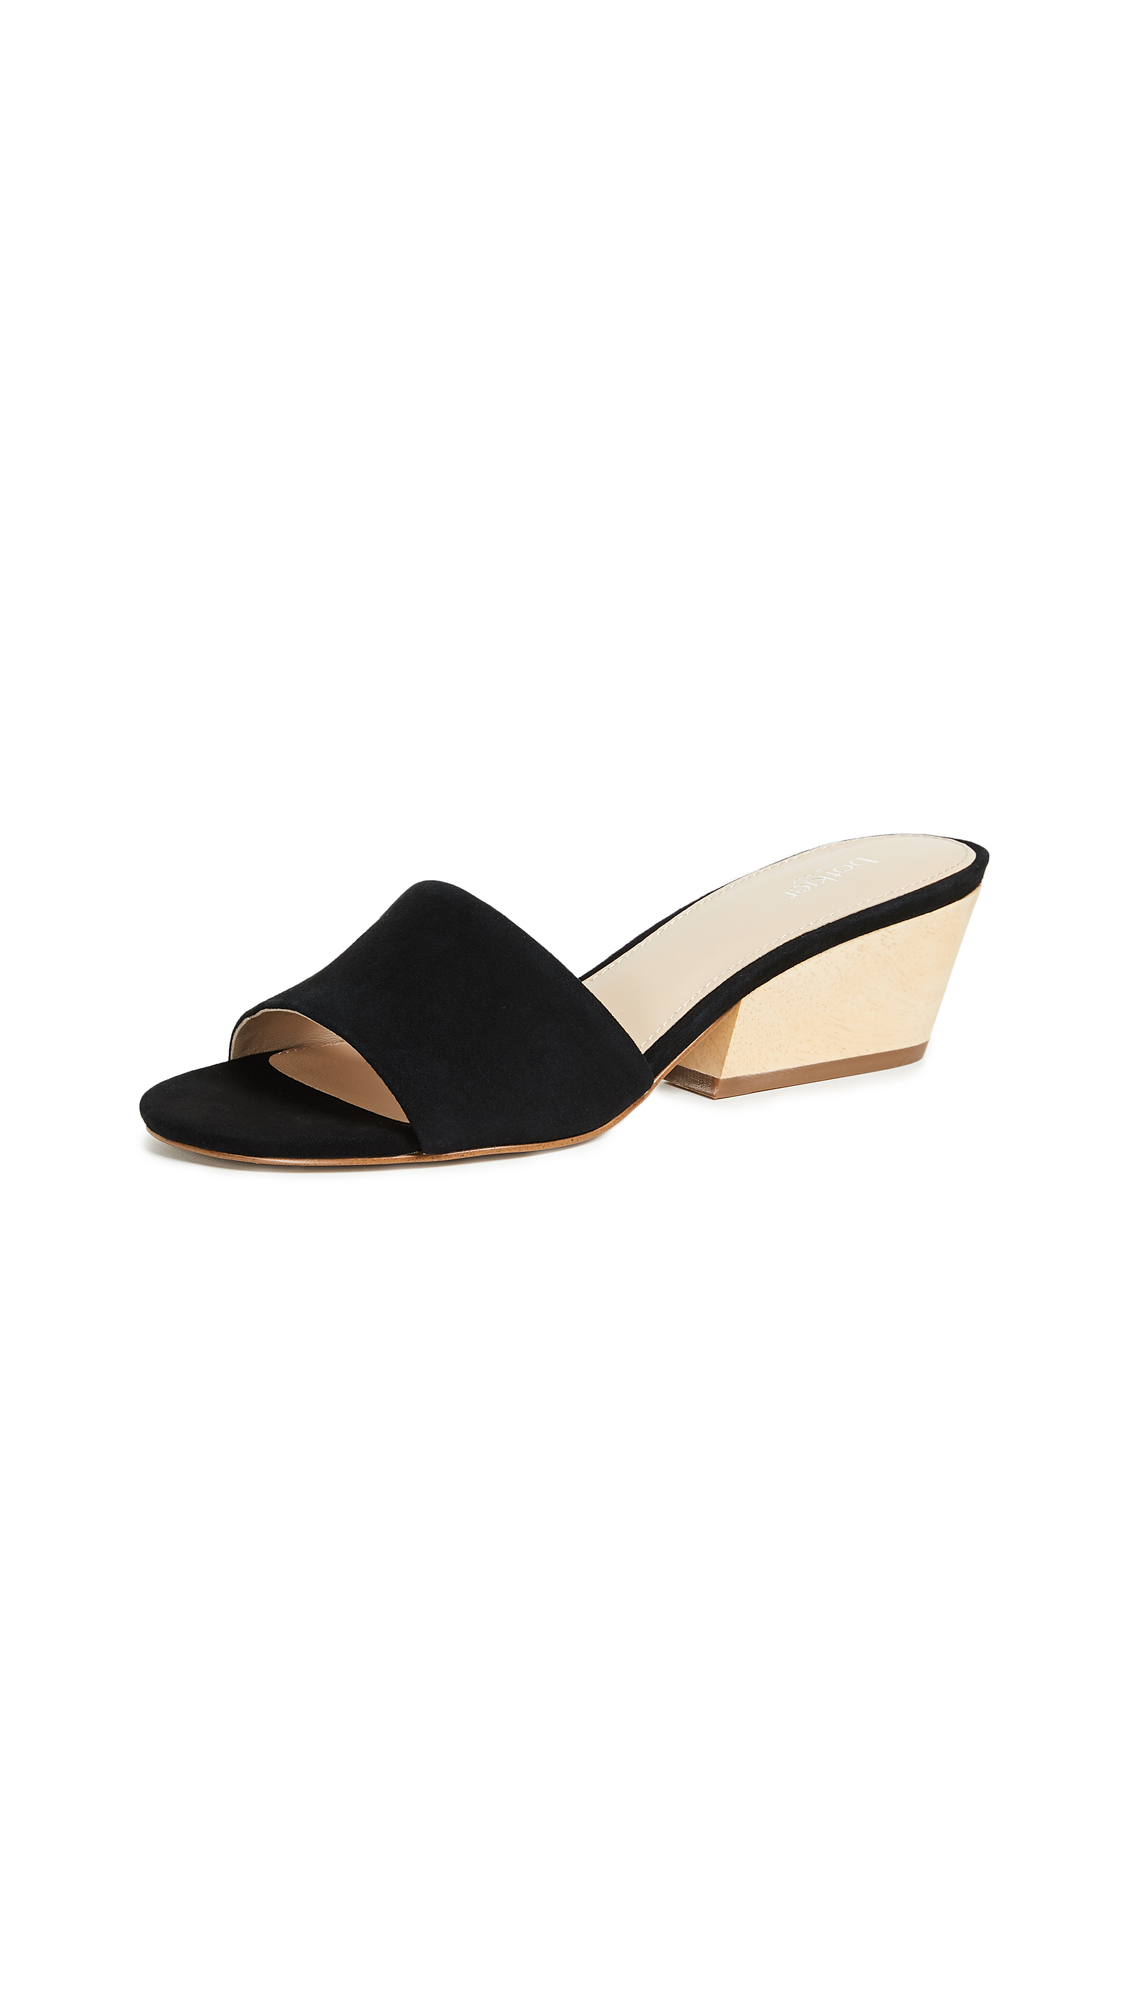 Botkier Carlie Block Heel Slides - Black